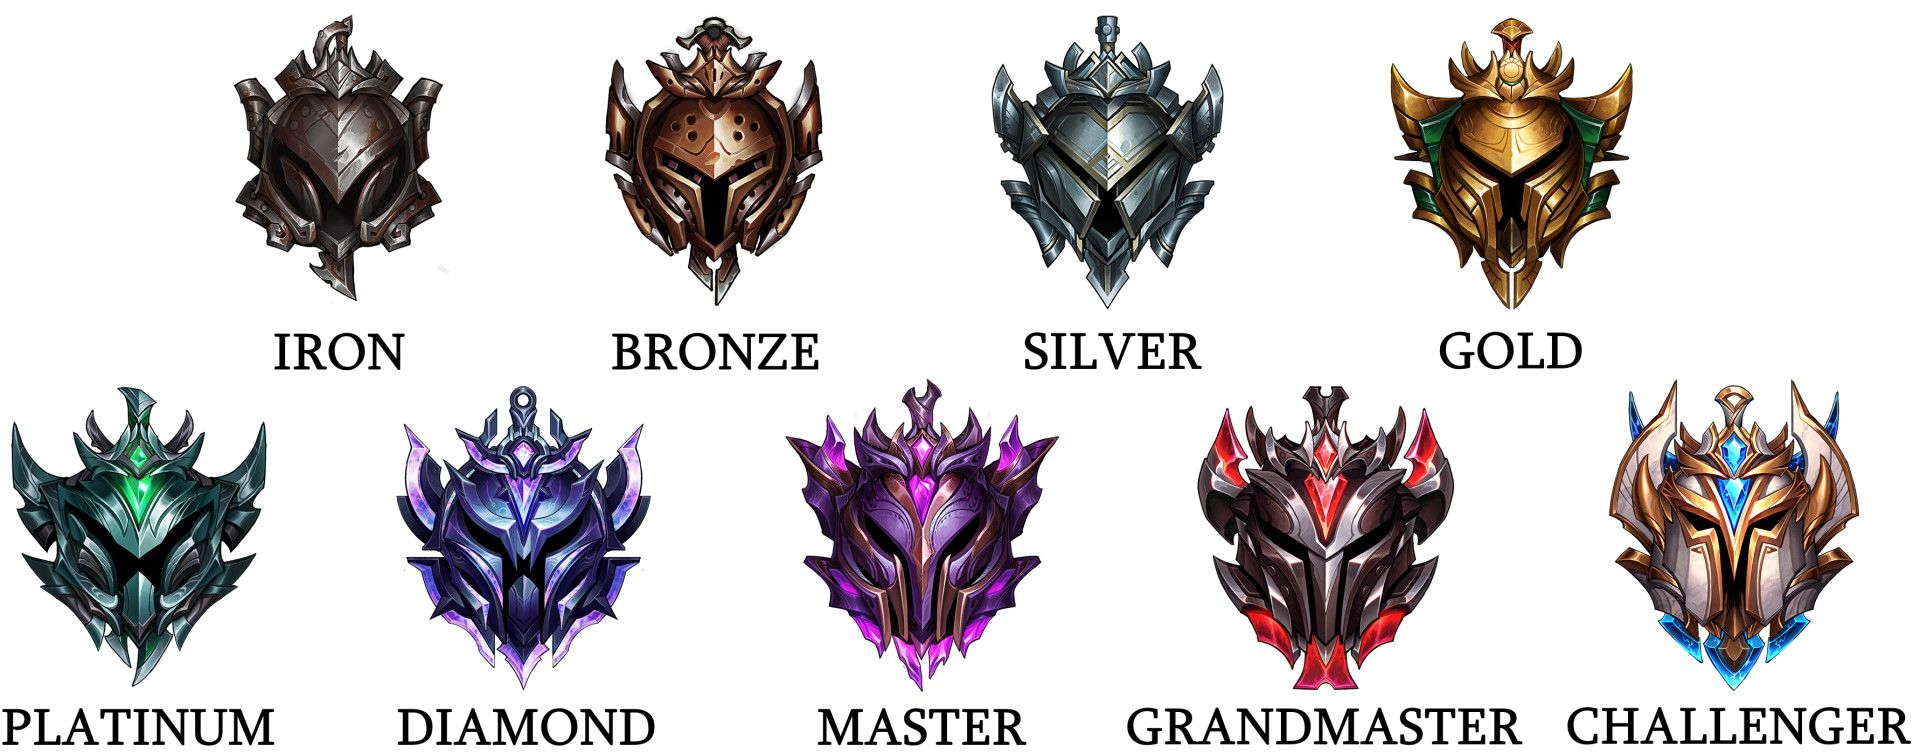 League of Legends all Ranks: Iron, Bronze, Silver, Gold, Platinum, Diamond, Master, Grandmaster, Challenger